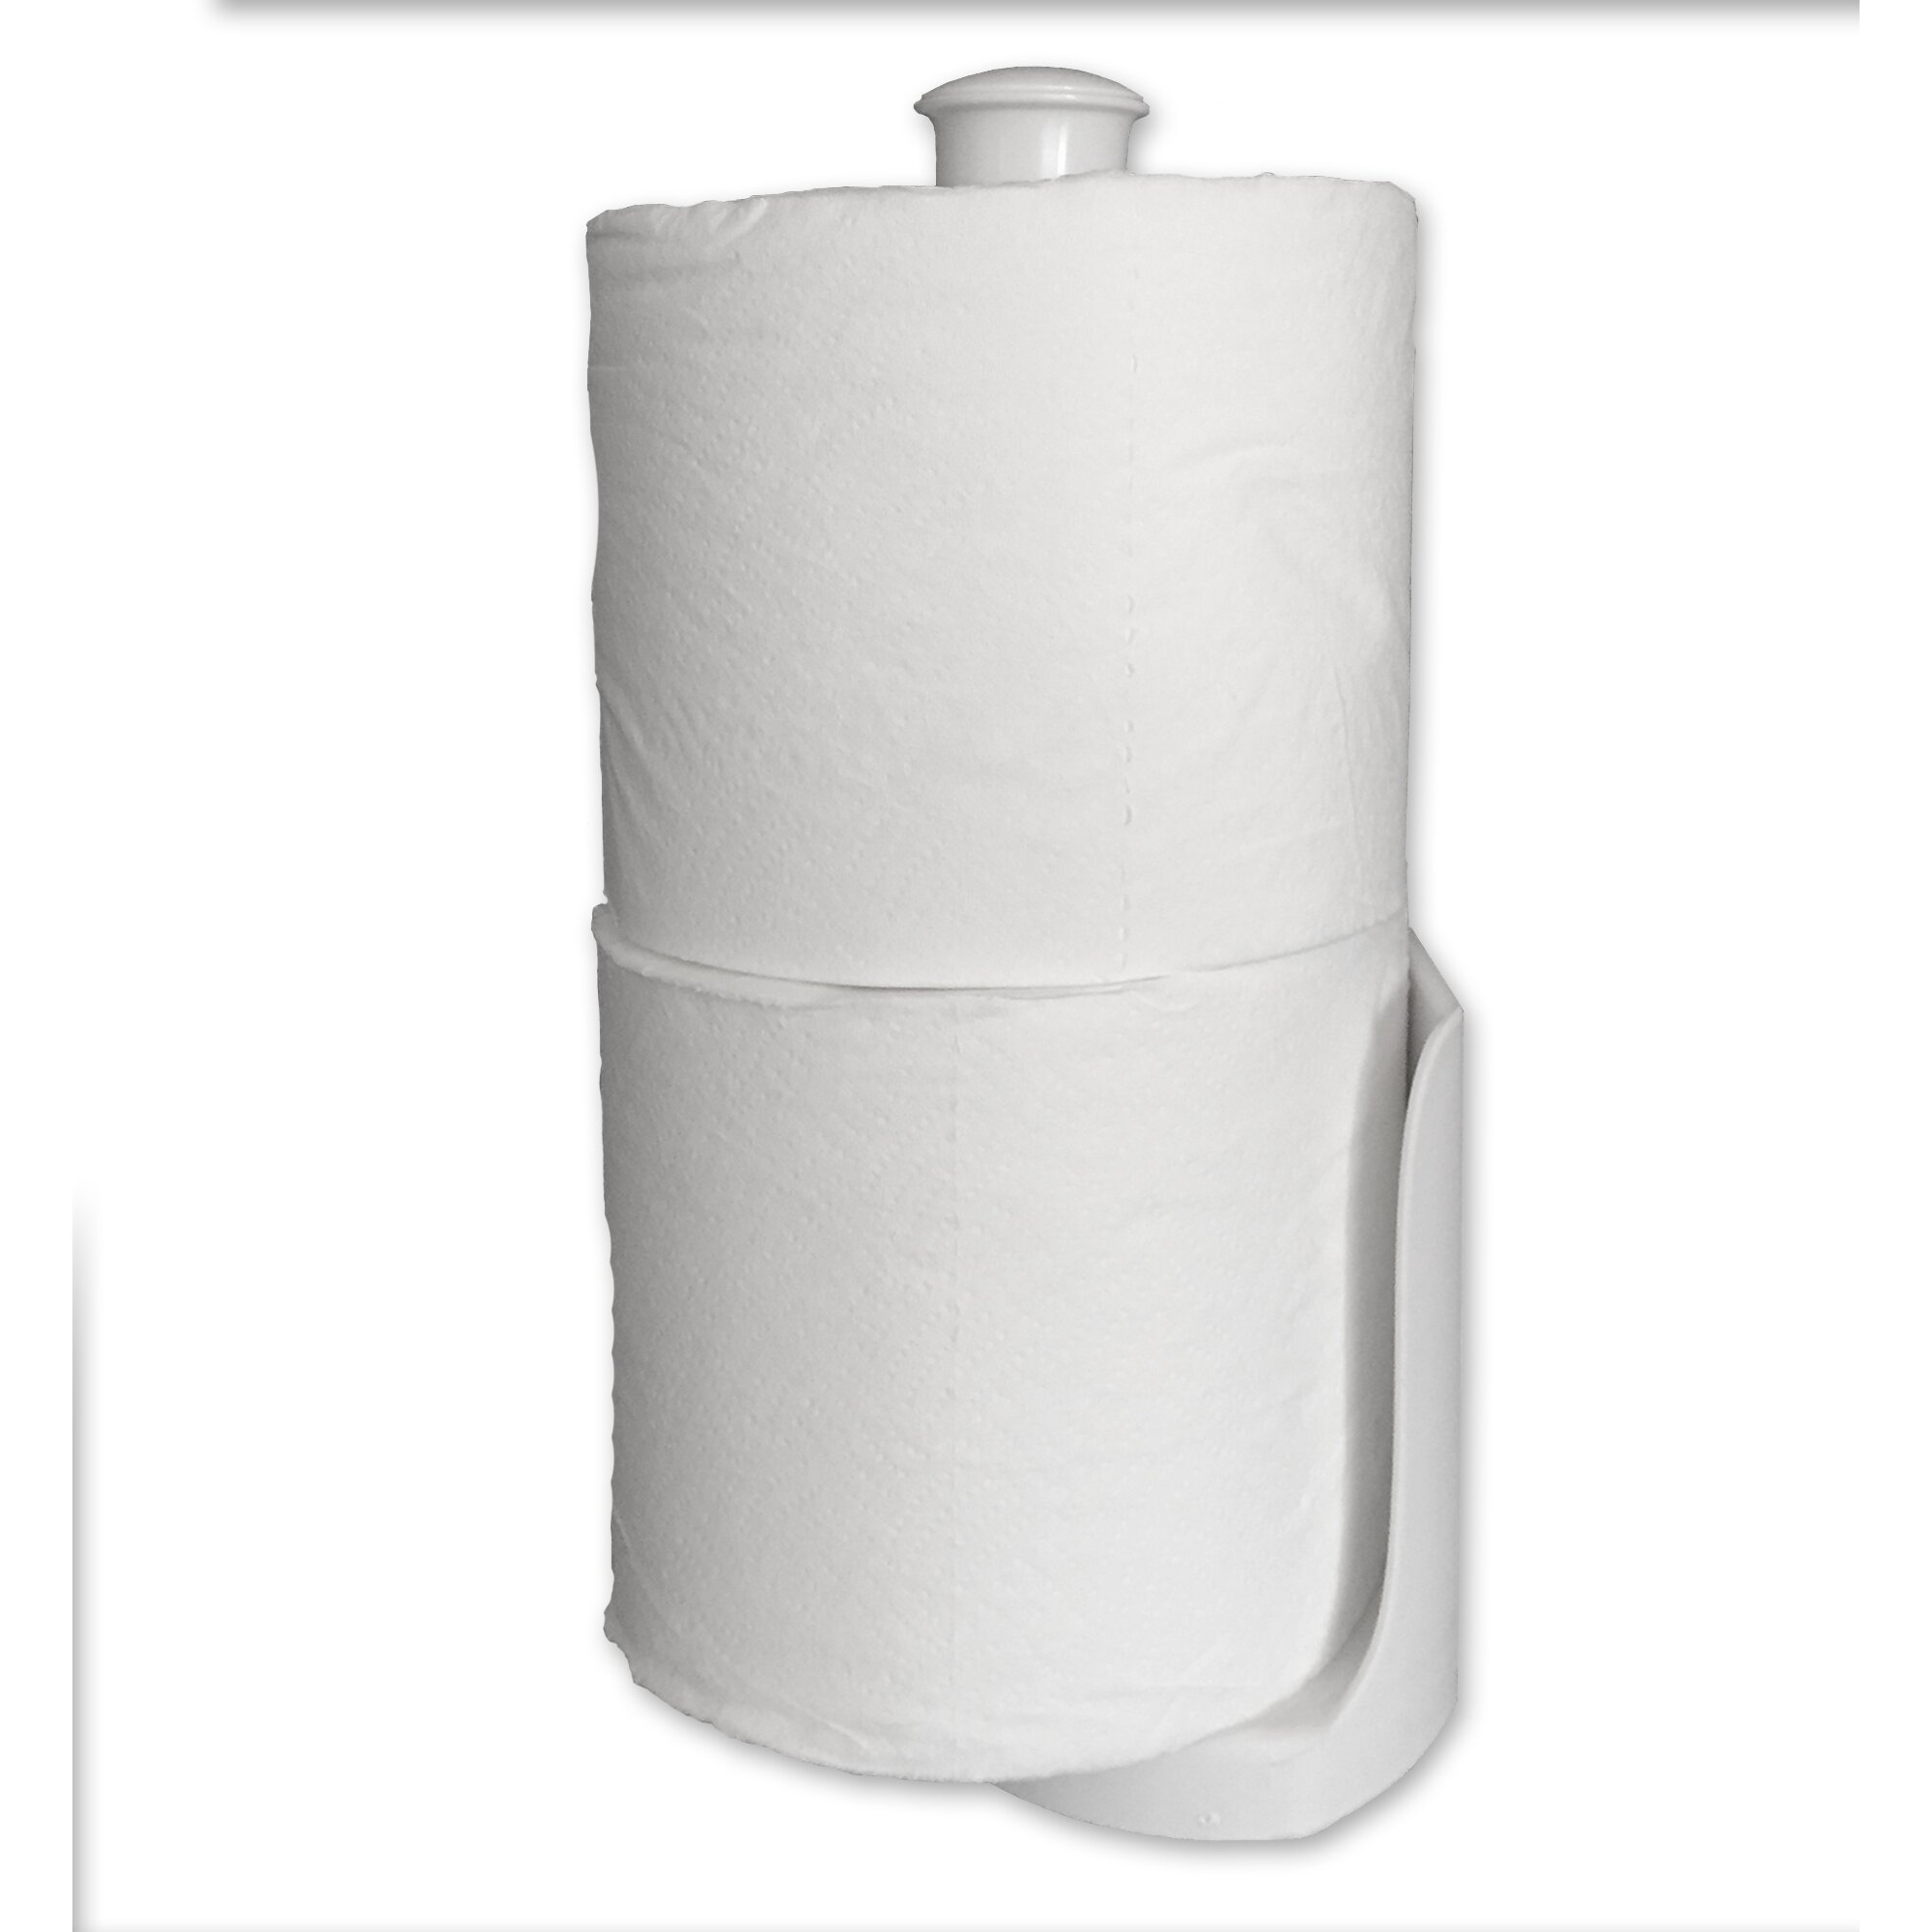 Handy Holder Spare Toilet Paper Holder Wayfair